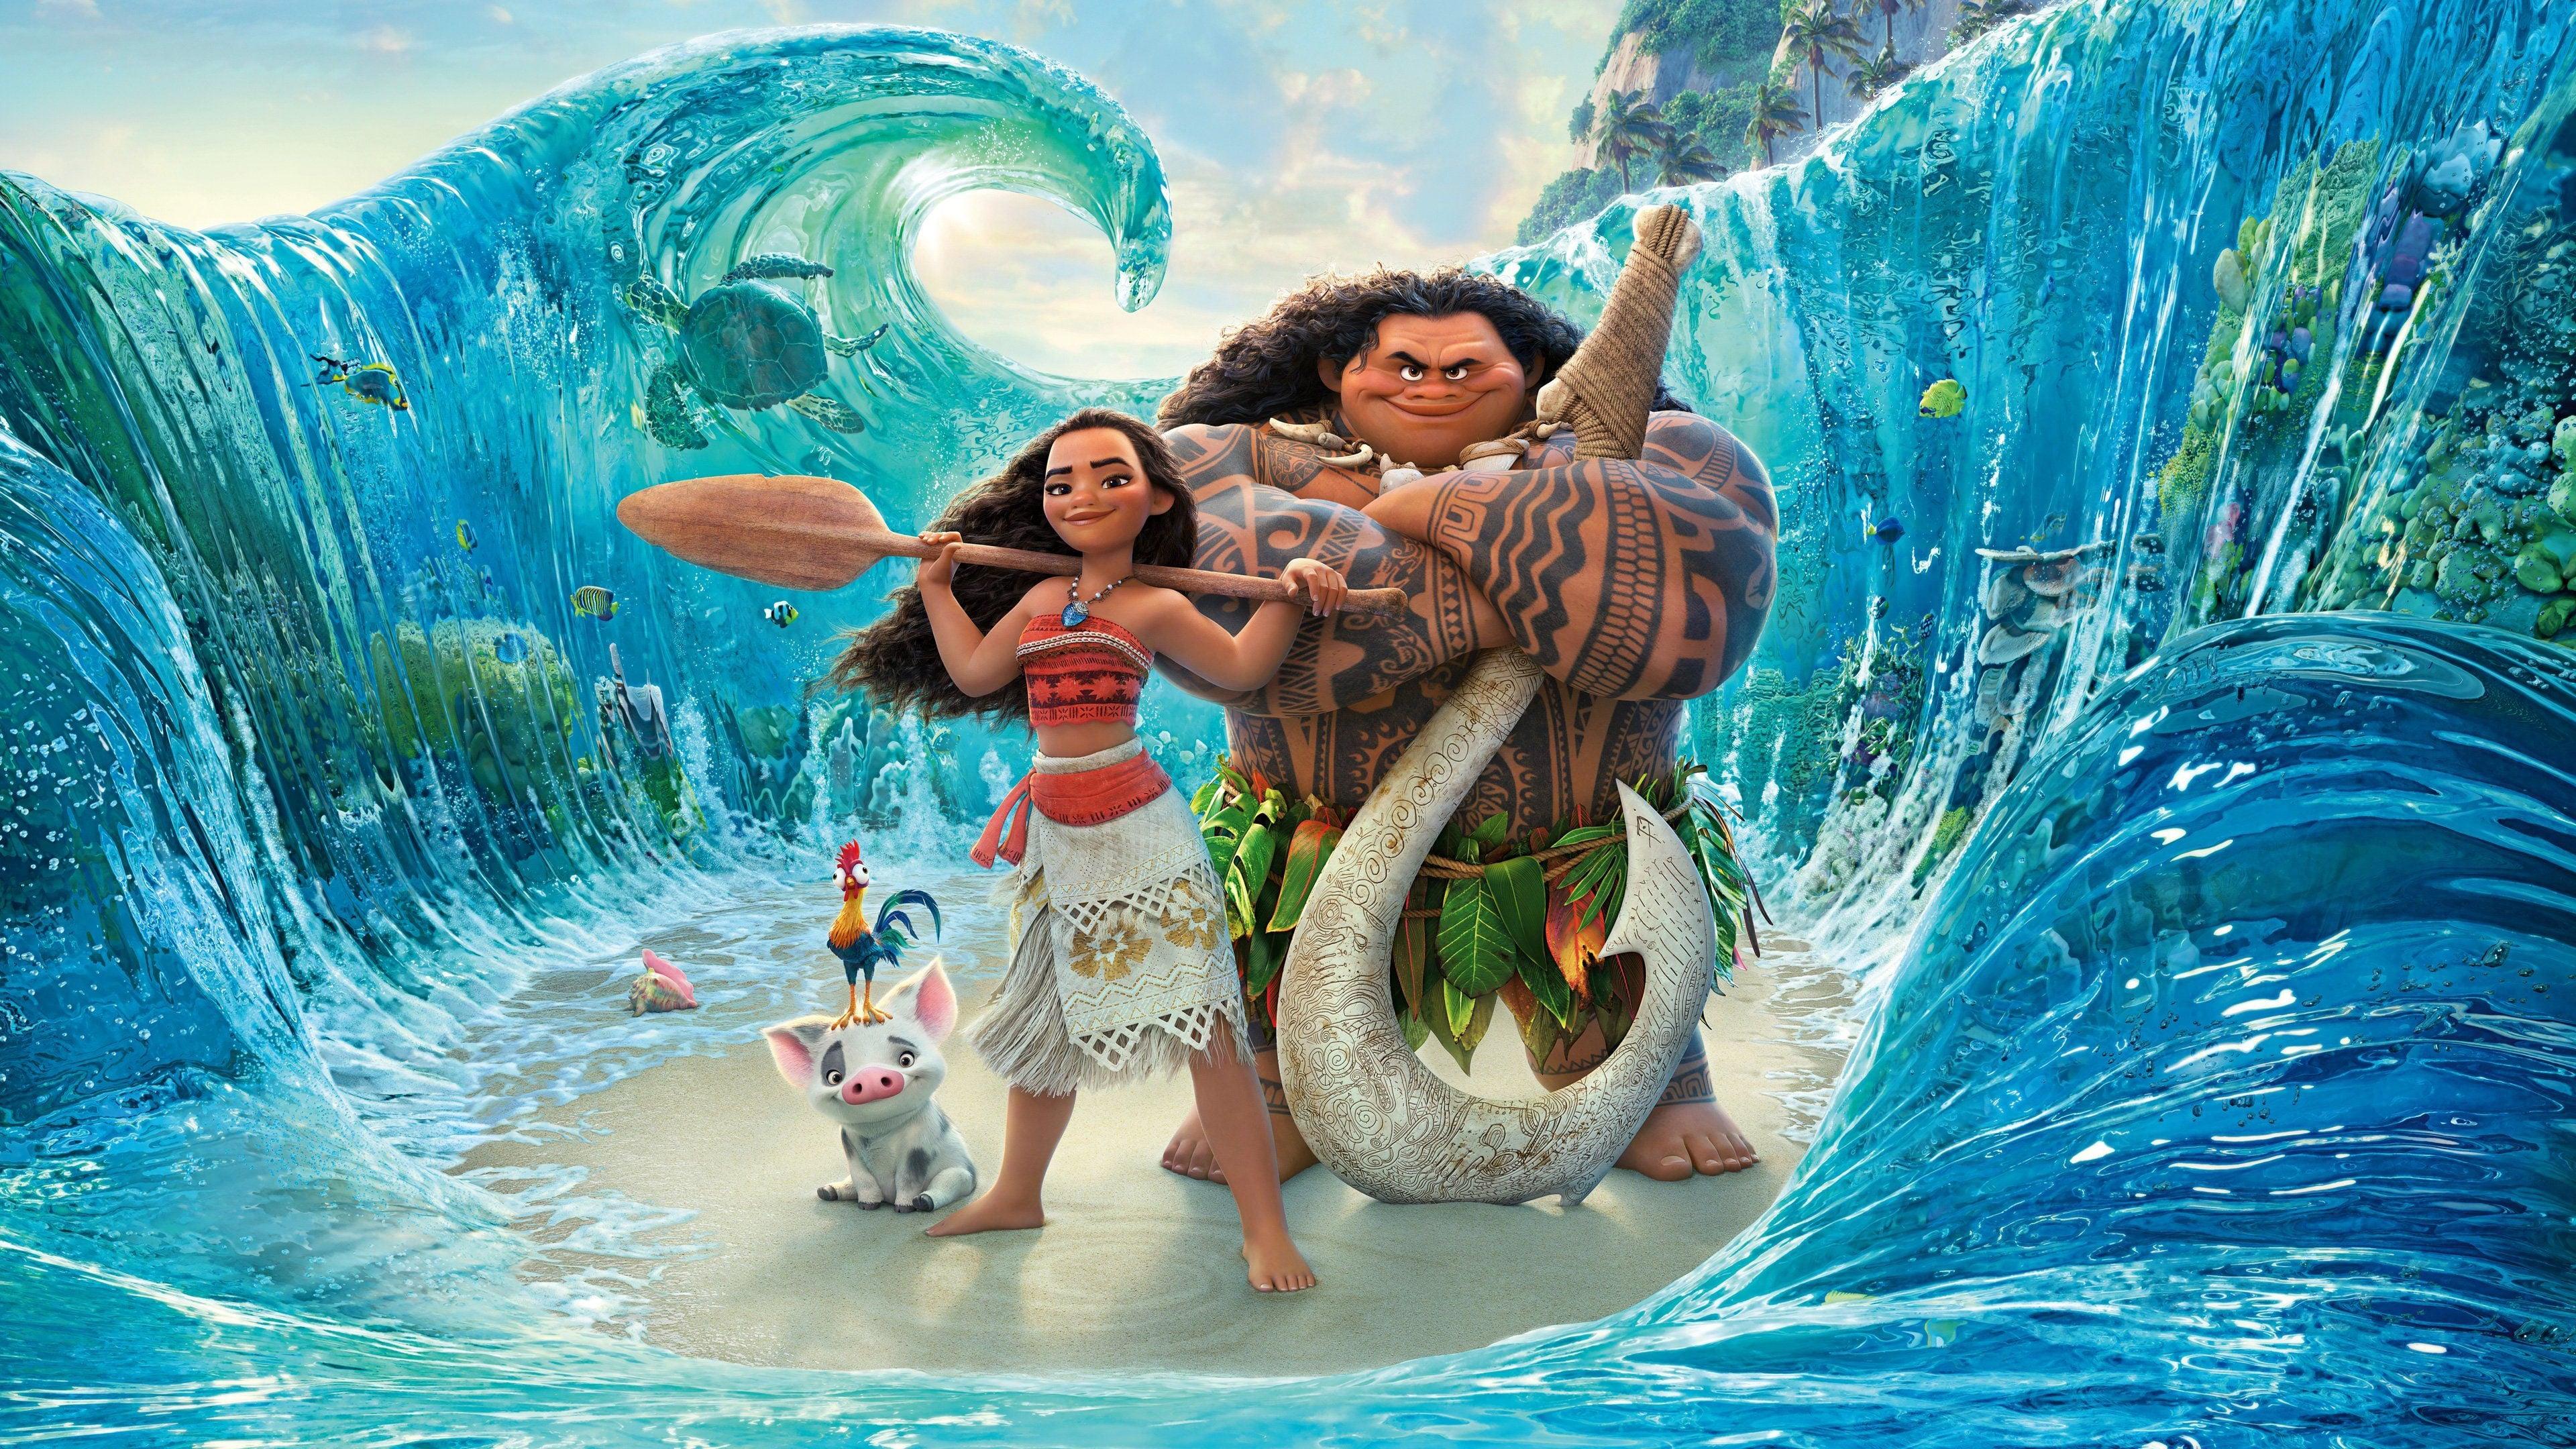 moana full movie download in tamilrockers